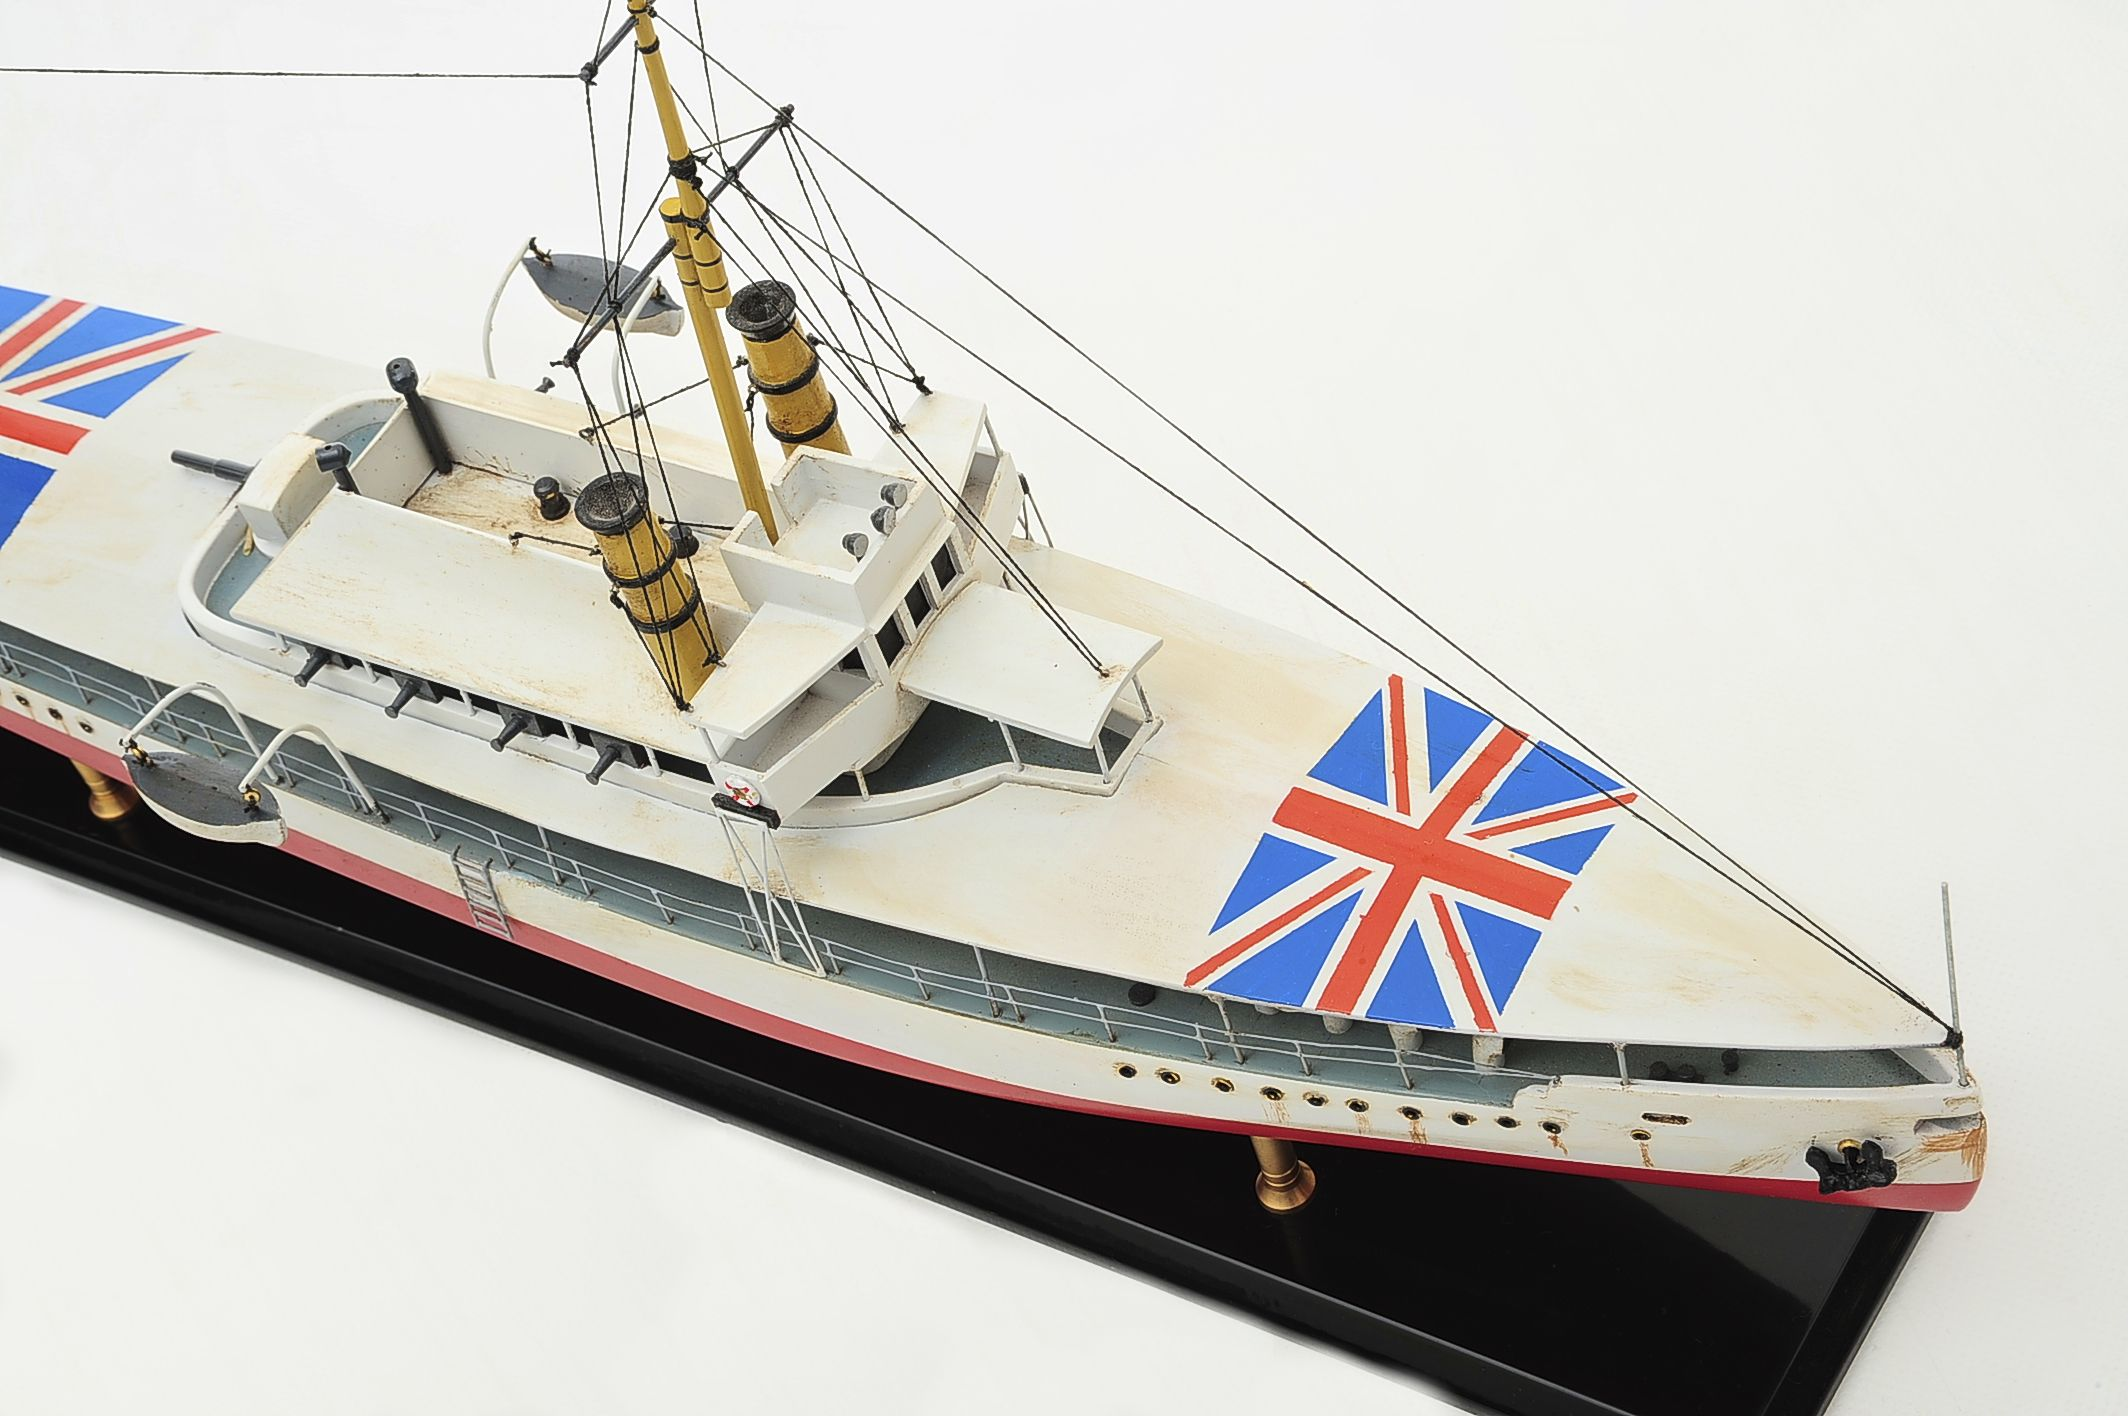 1392-6178-HMS-Cockchafer-Premier-Range